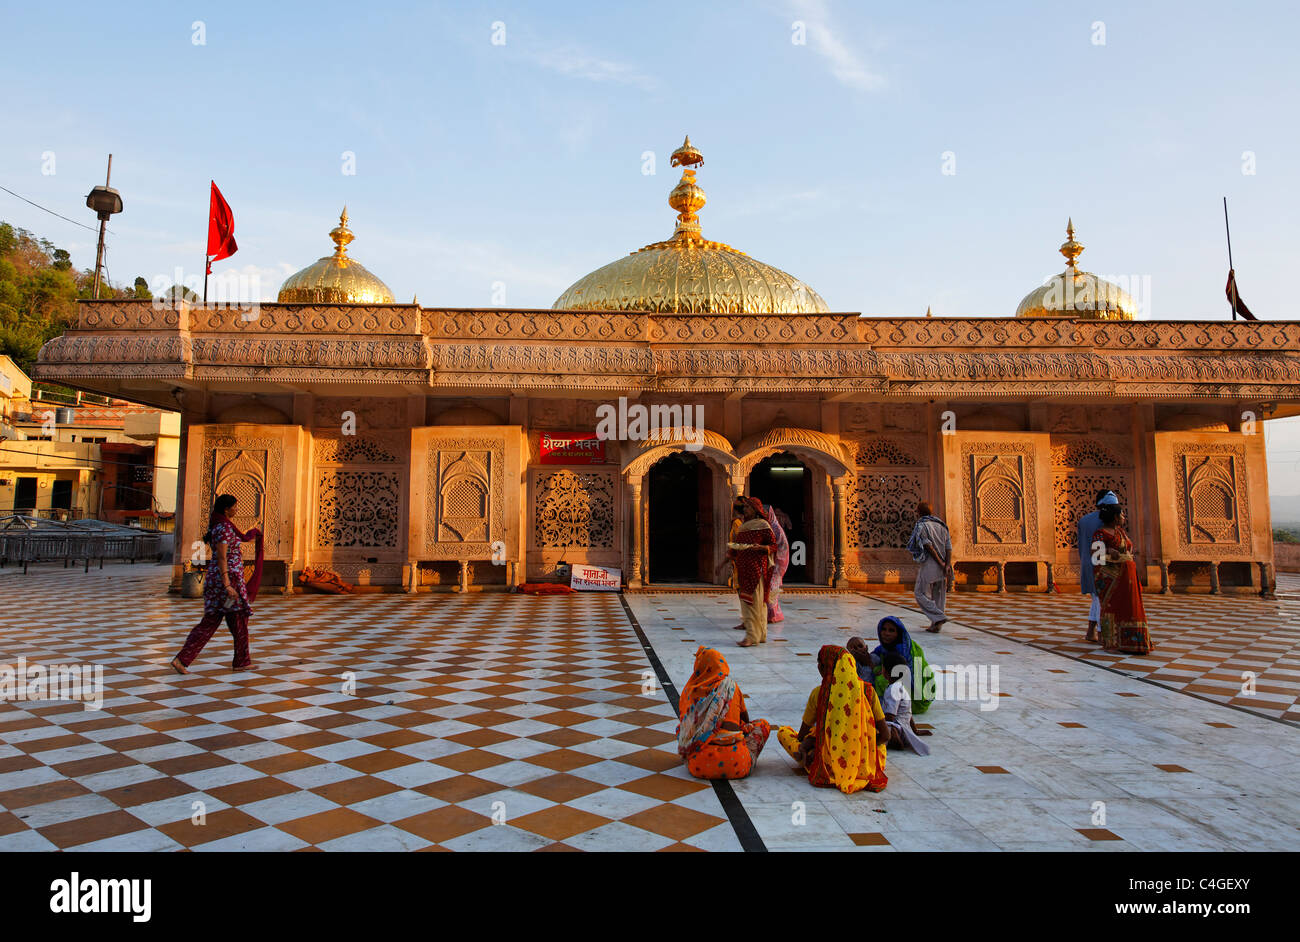 India - Himachal Pradesh - Jawalamukhi - Hindu shrine - Stock Image